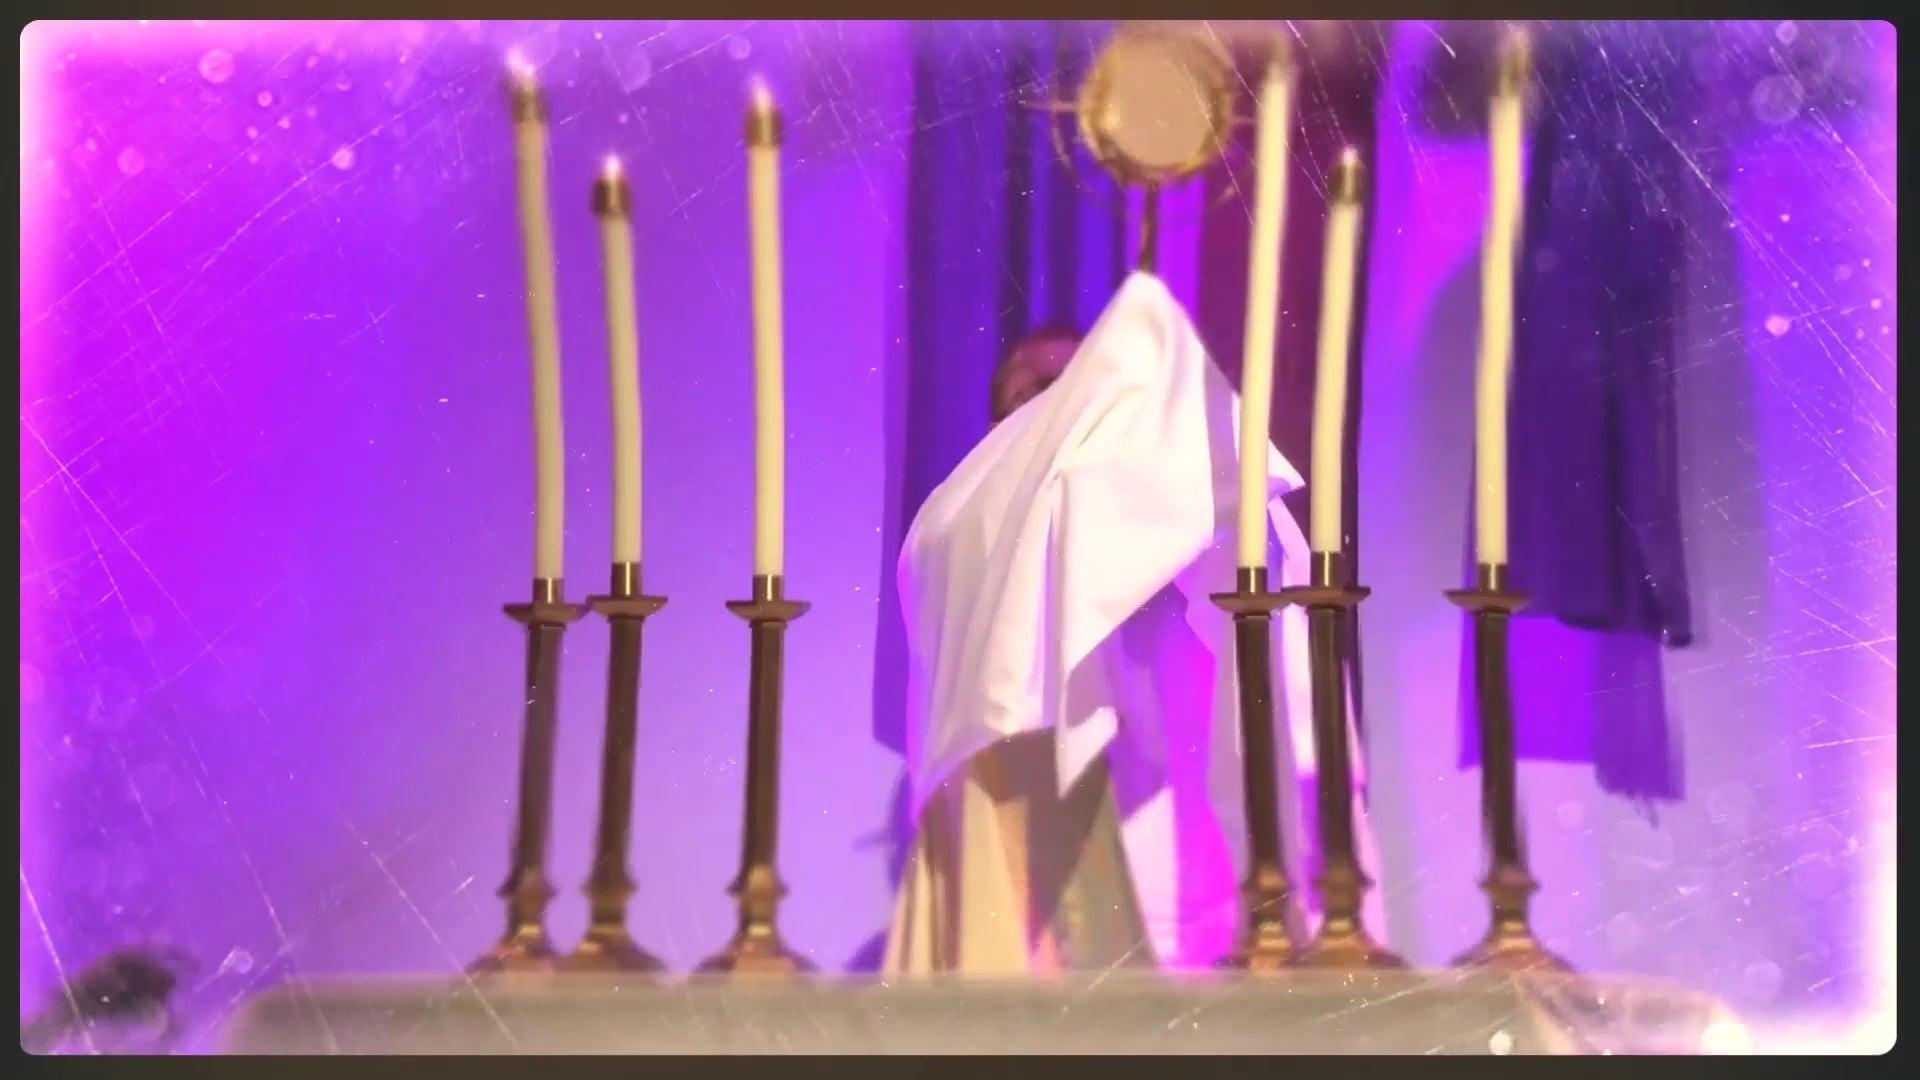 Encounter - The Spiritual Legacy of St. Francis de Sales, Part 1